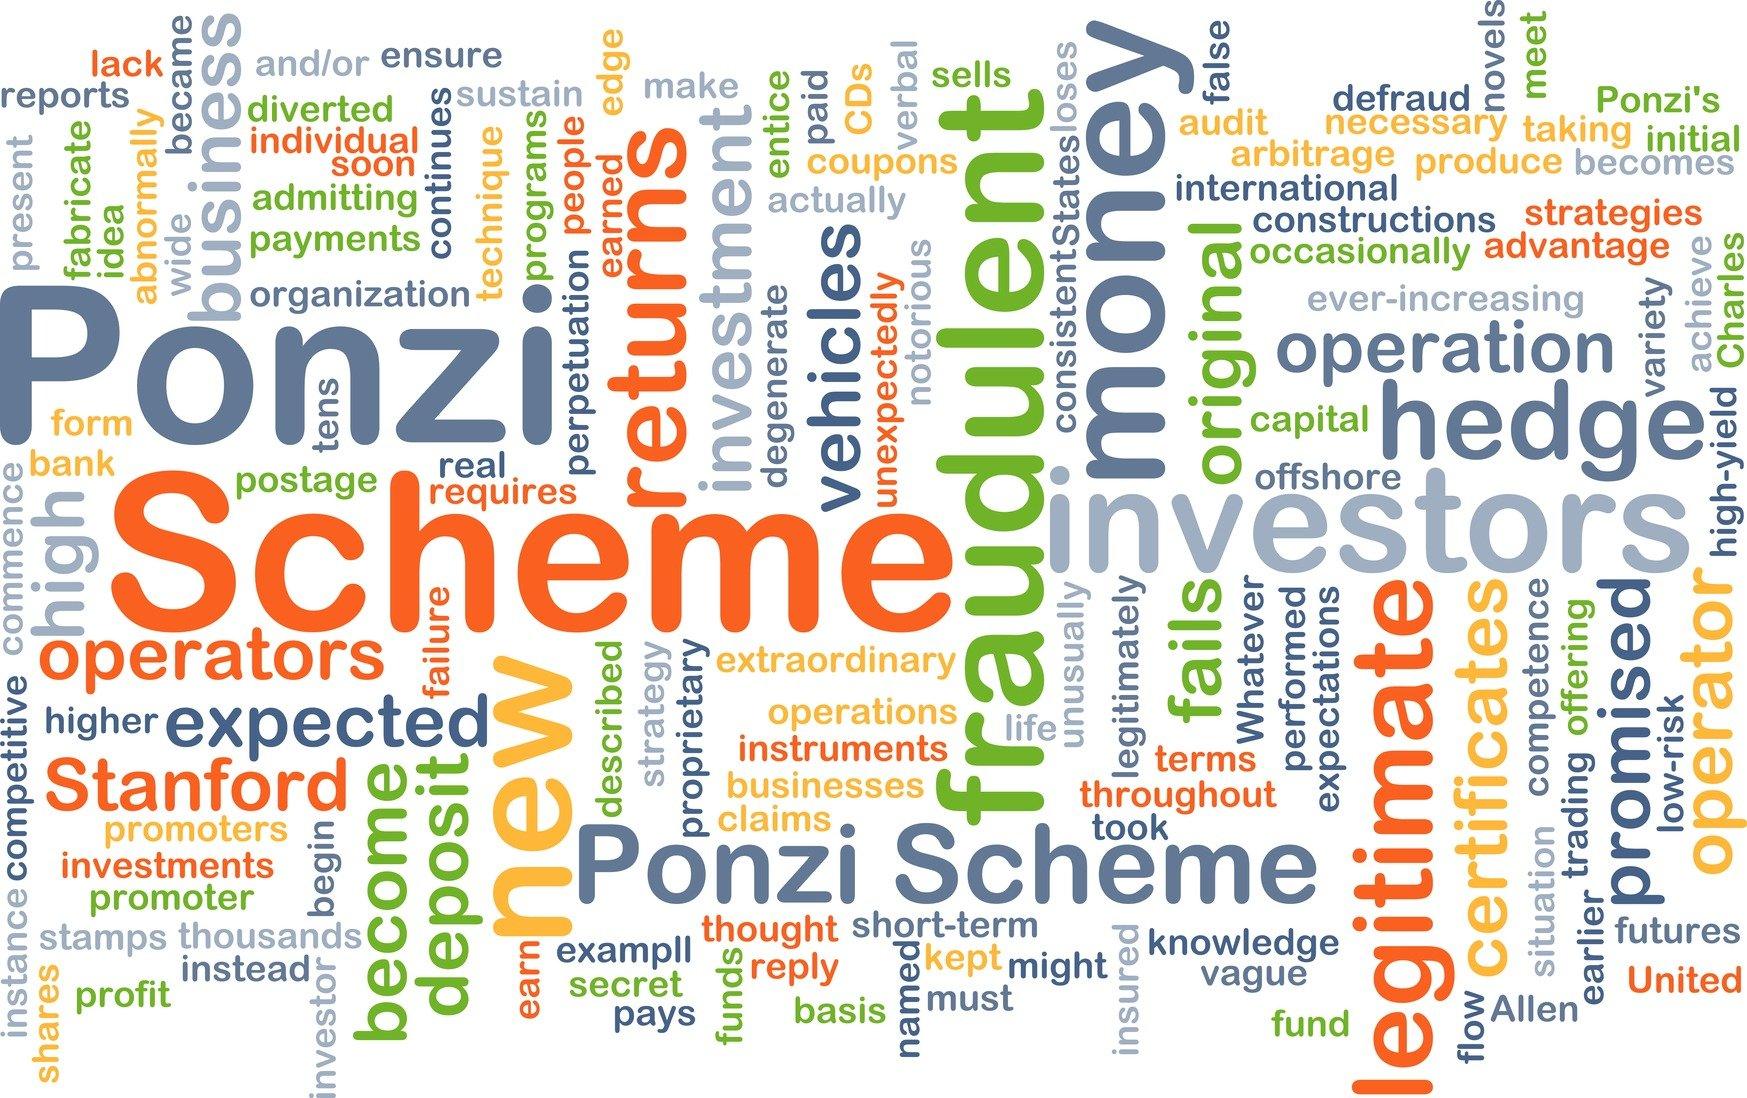 ponzi_scheme